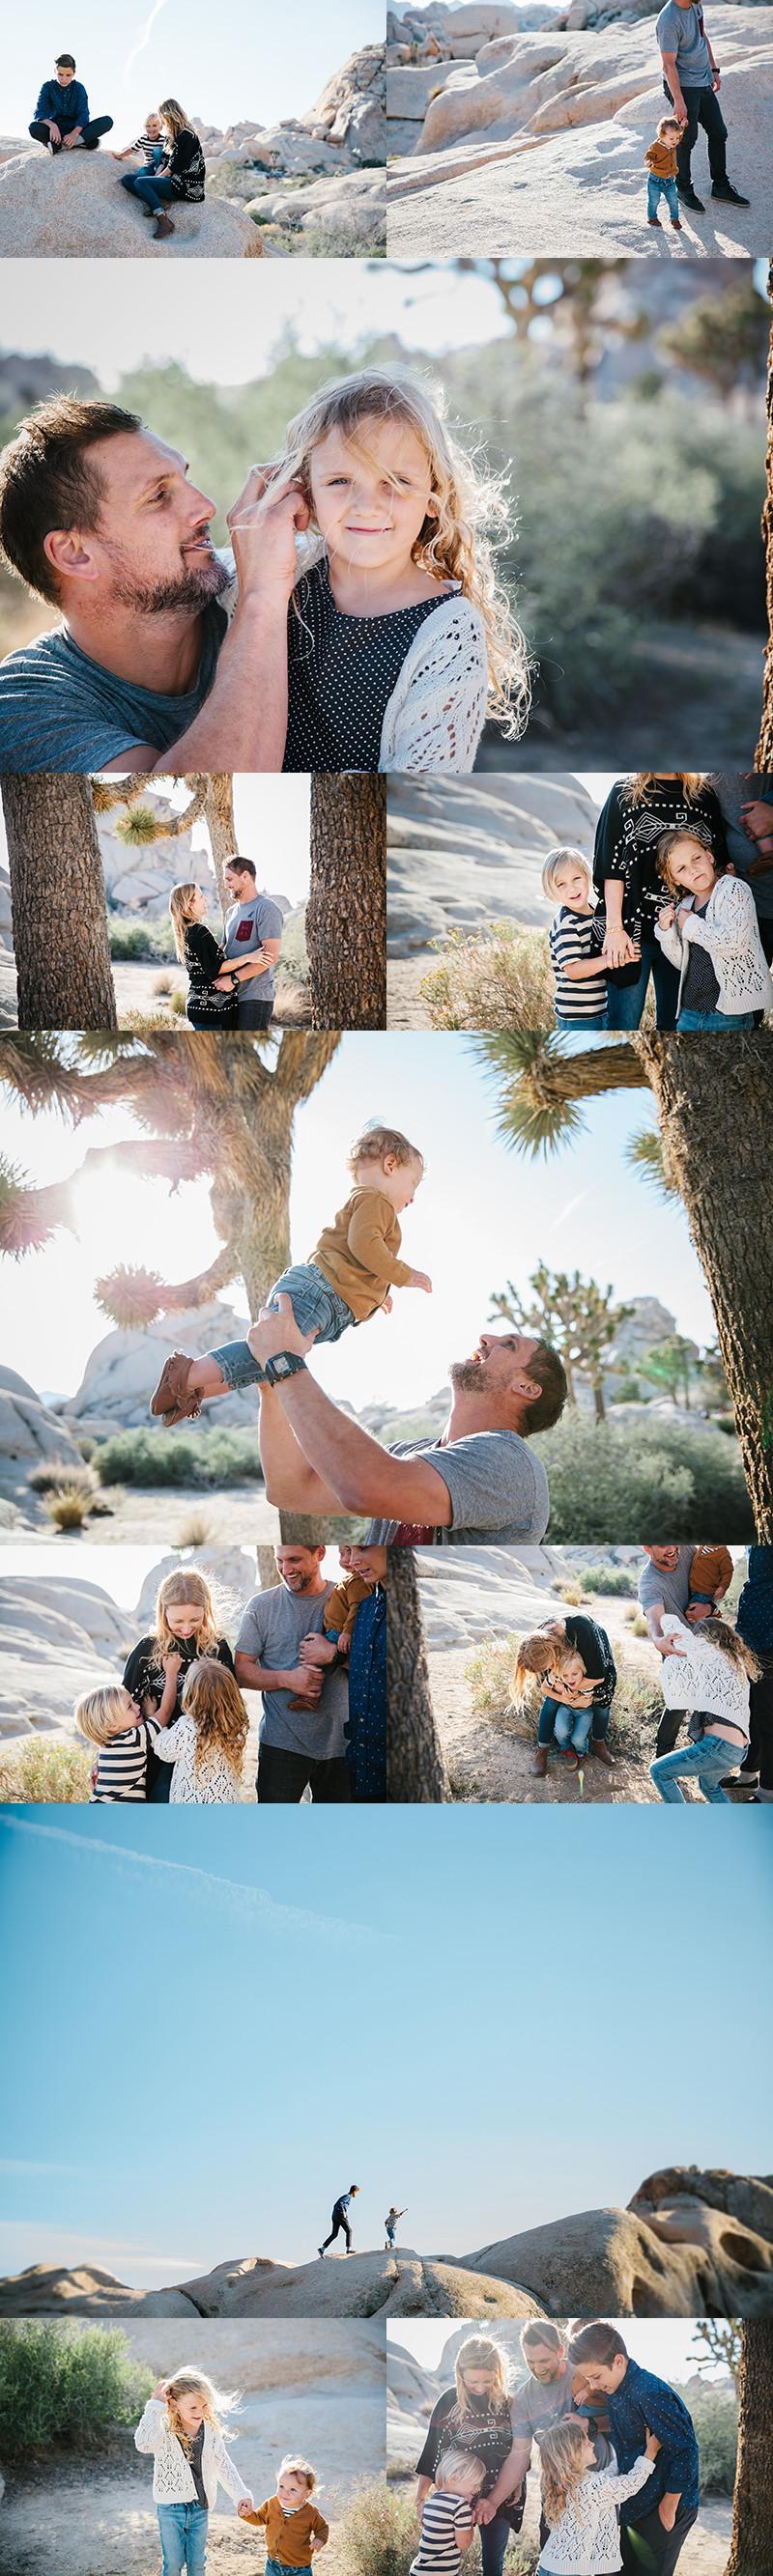 gphotoco_trounce_family.jpg